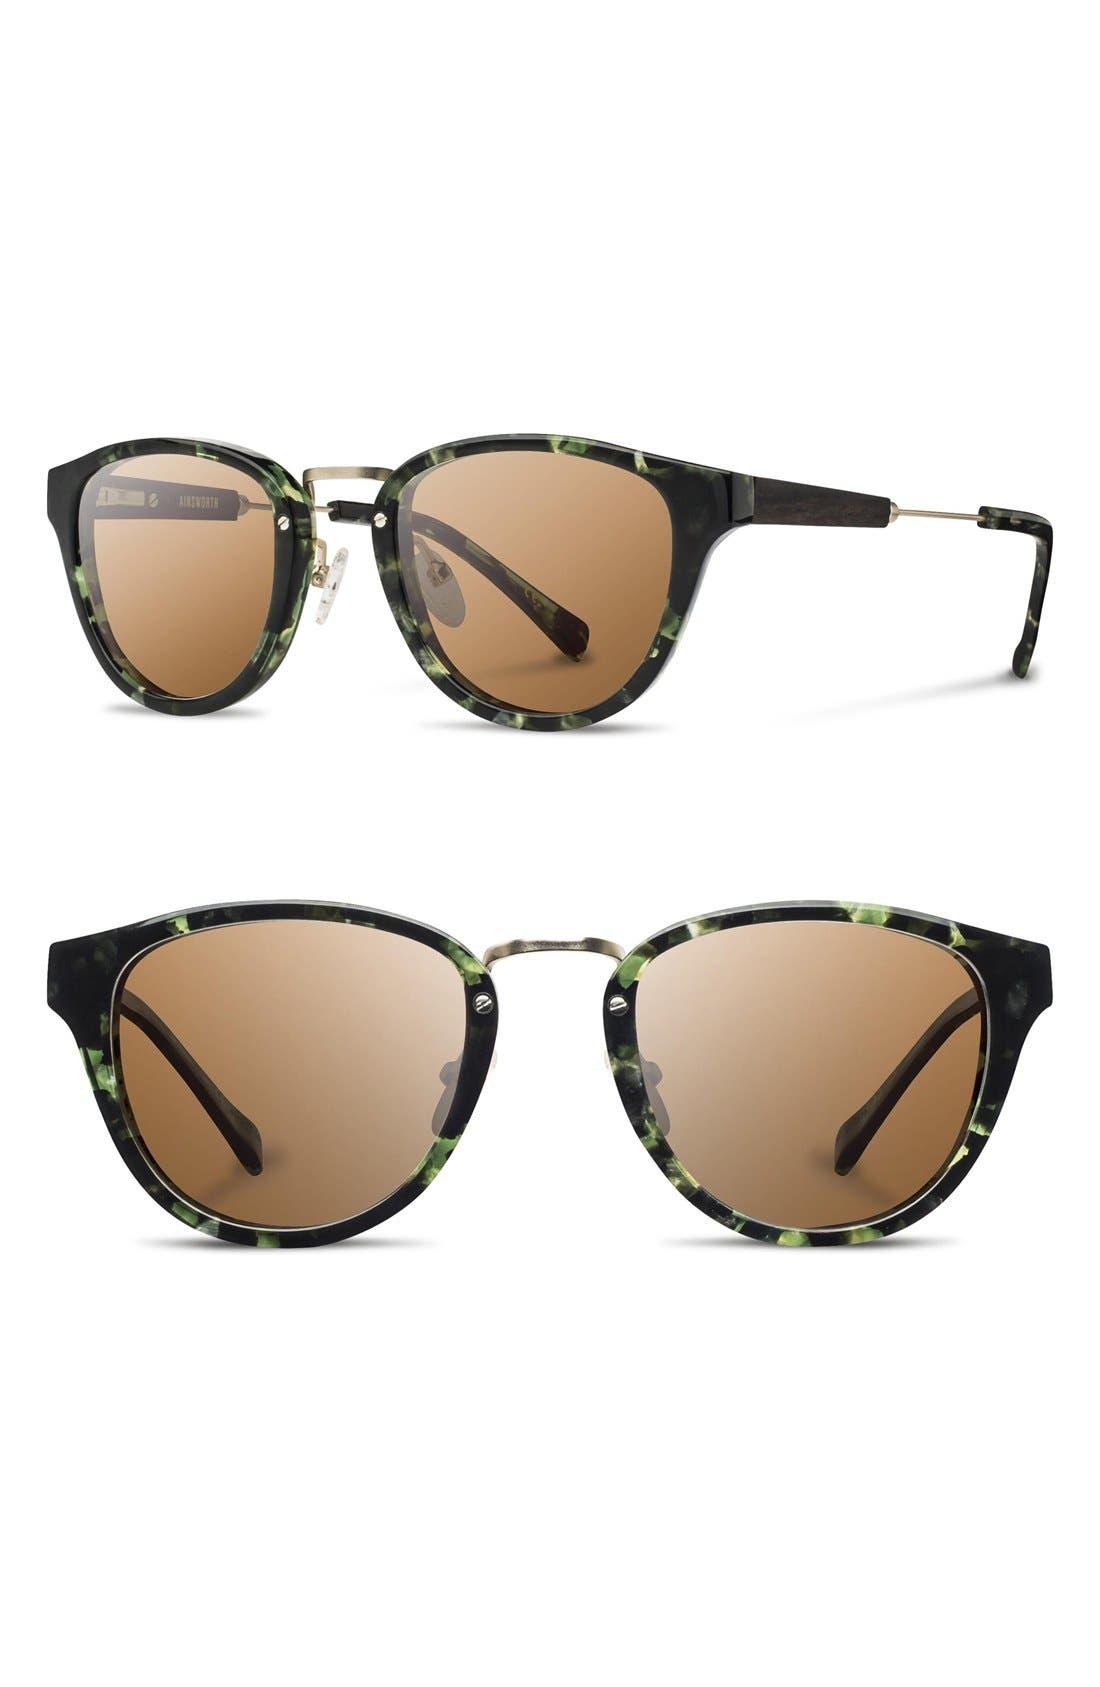 Alternate Image 1 Selected - Shwood 'Ainsworth' 49mm Polarized Sunglasses